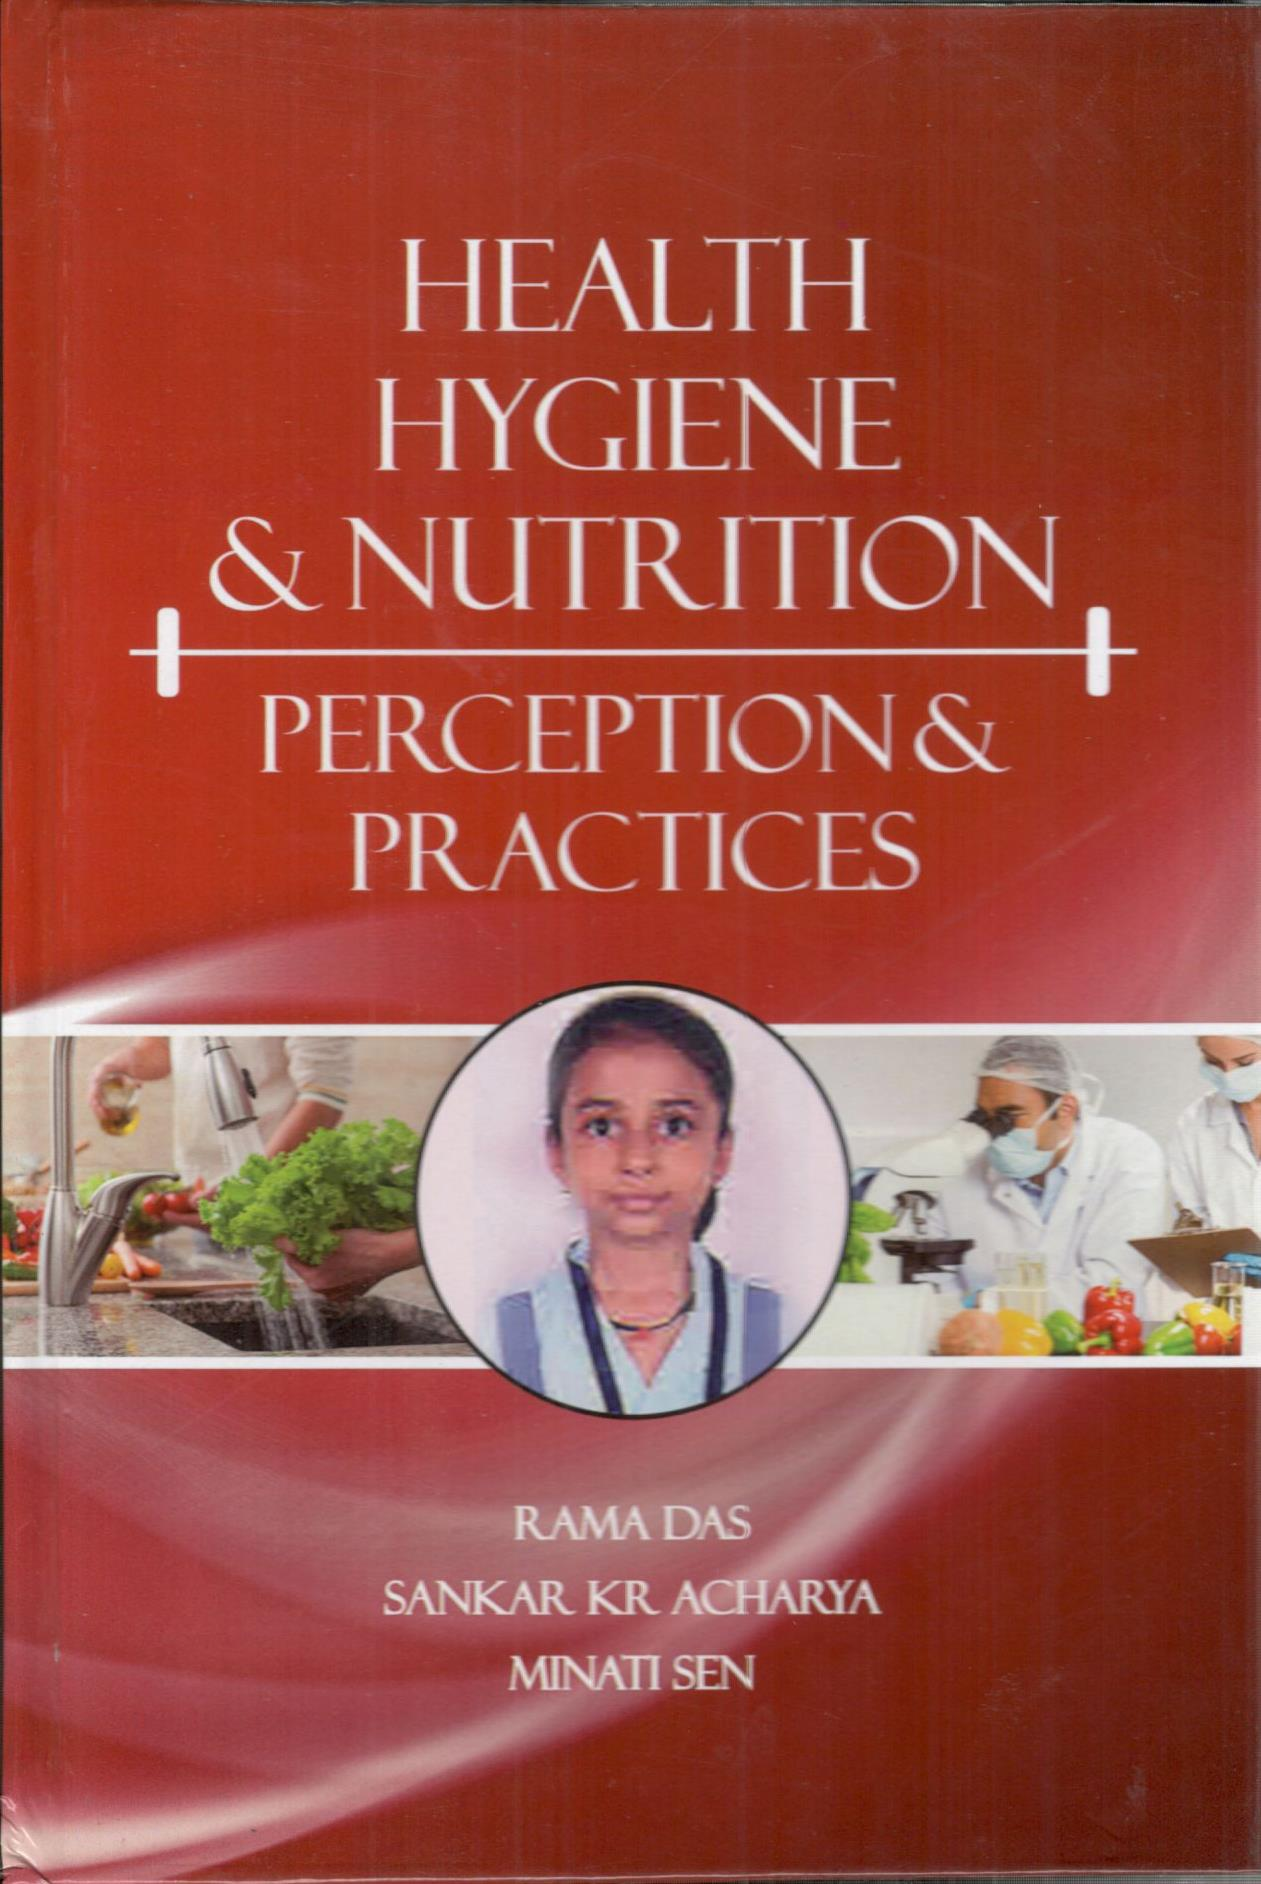 Health Hygiene & Nutrition: Perception & Practices…